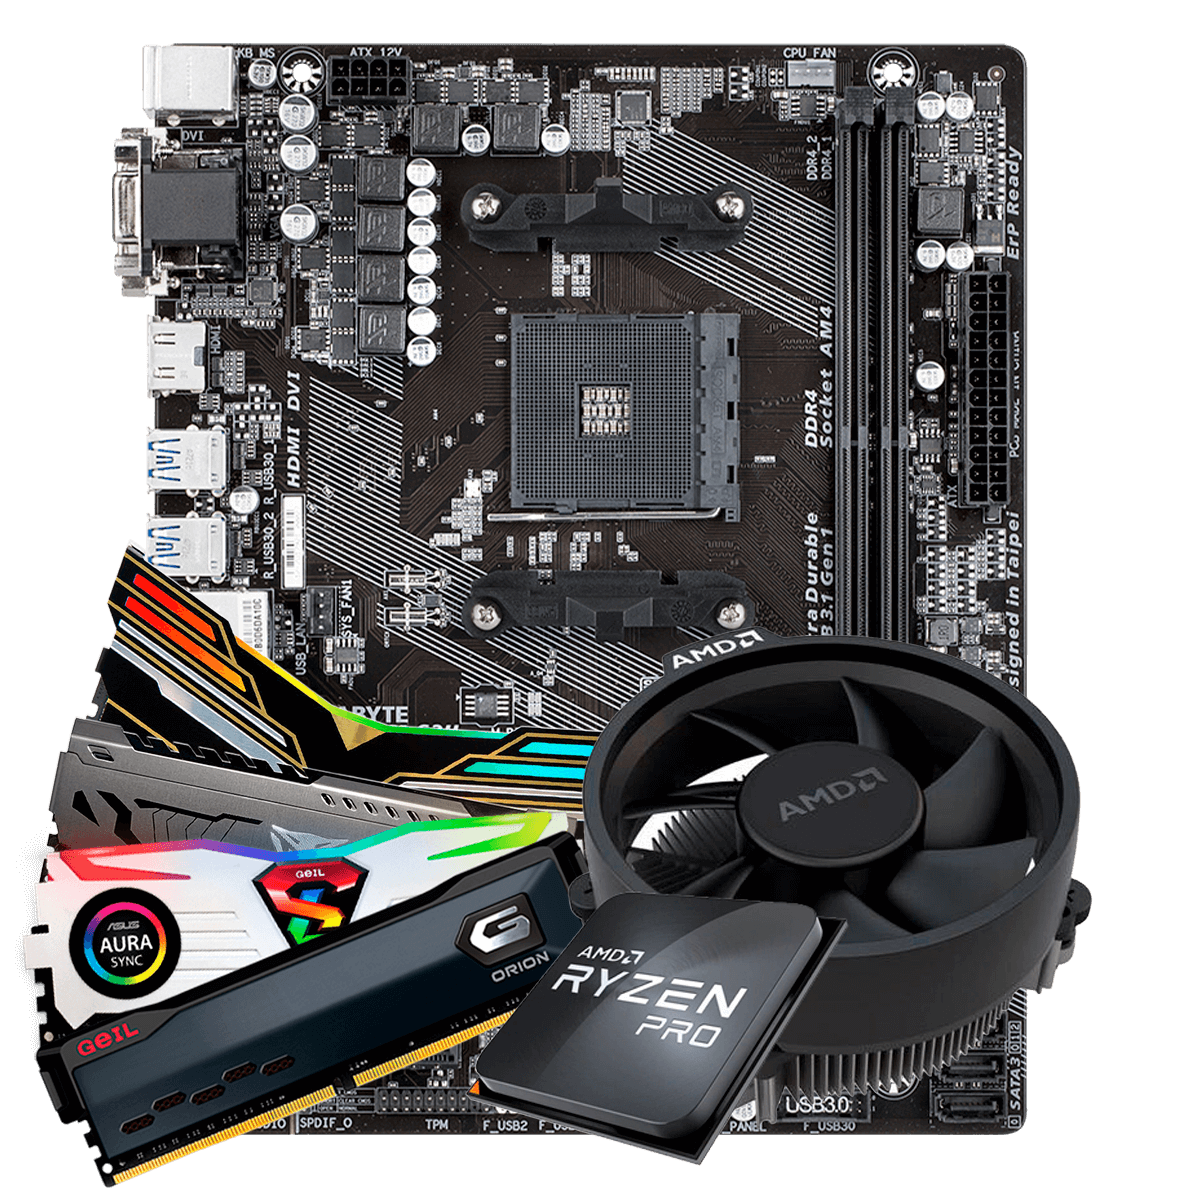 Kit Upgrade, AMD Ryzen 3 2200G, Gigabyte GA-A320M-S2H, Memória DDR4 8GB 3000MHz